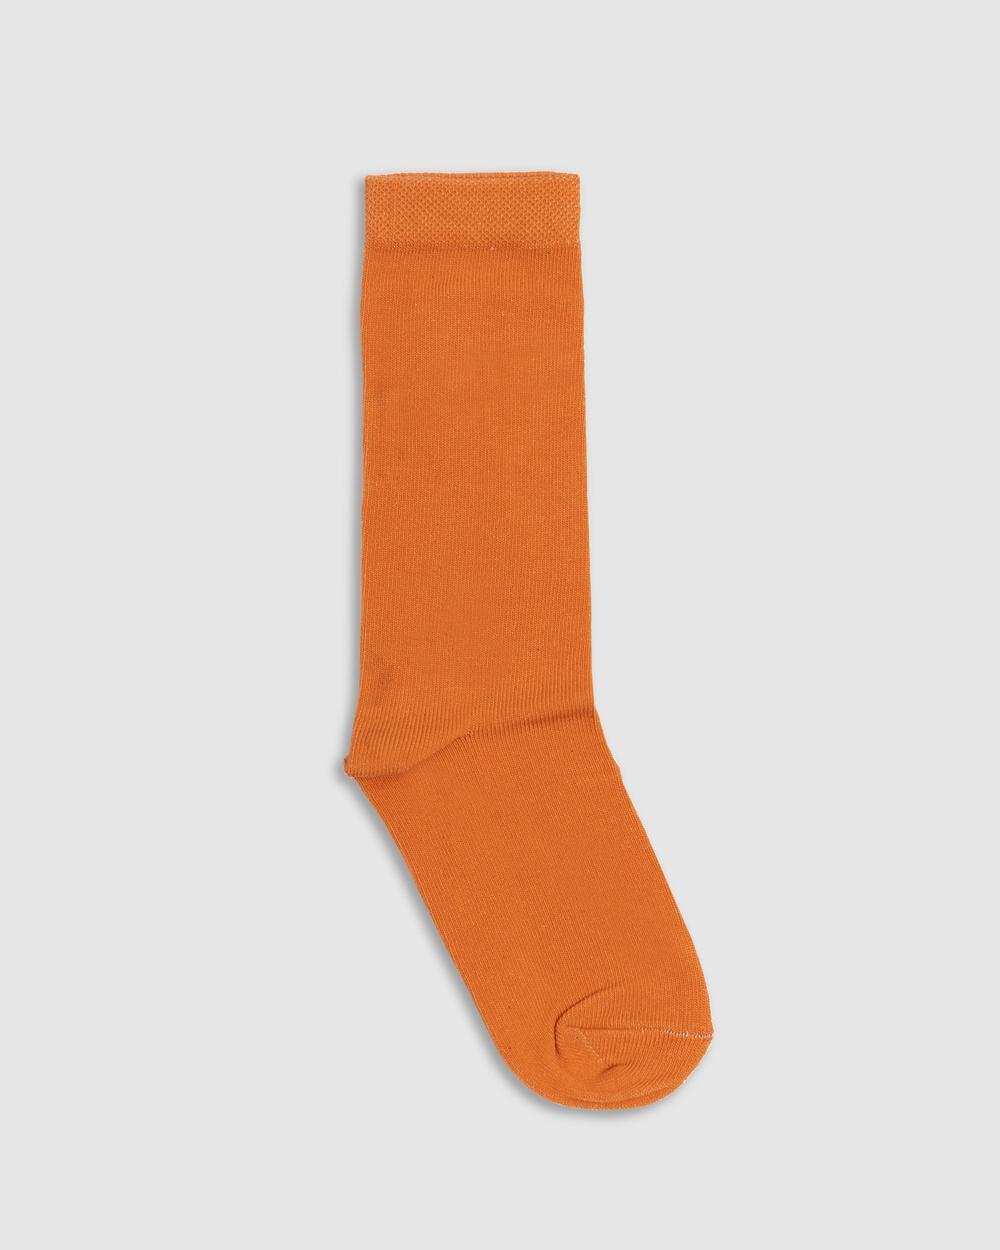 NICO Amber Organic Cotton Crew Socks Rust Shorts Rust Australia